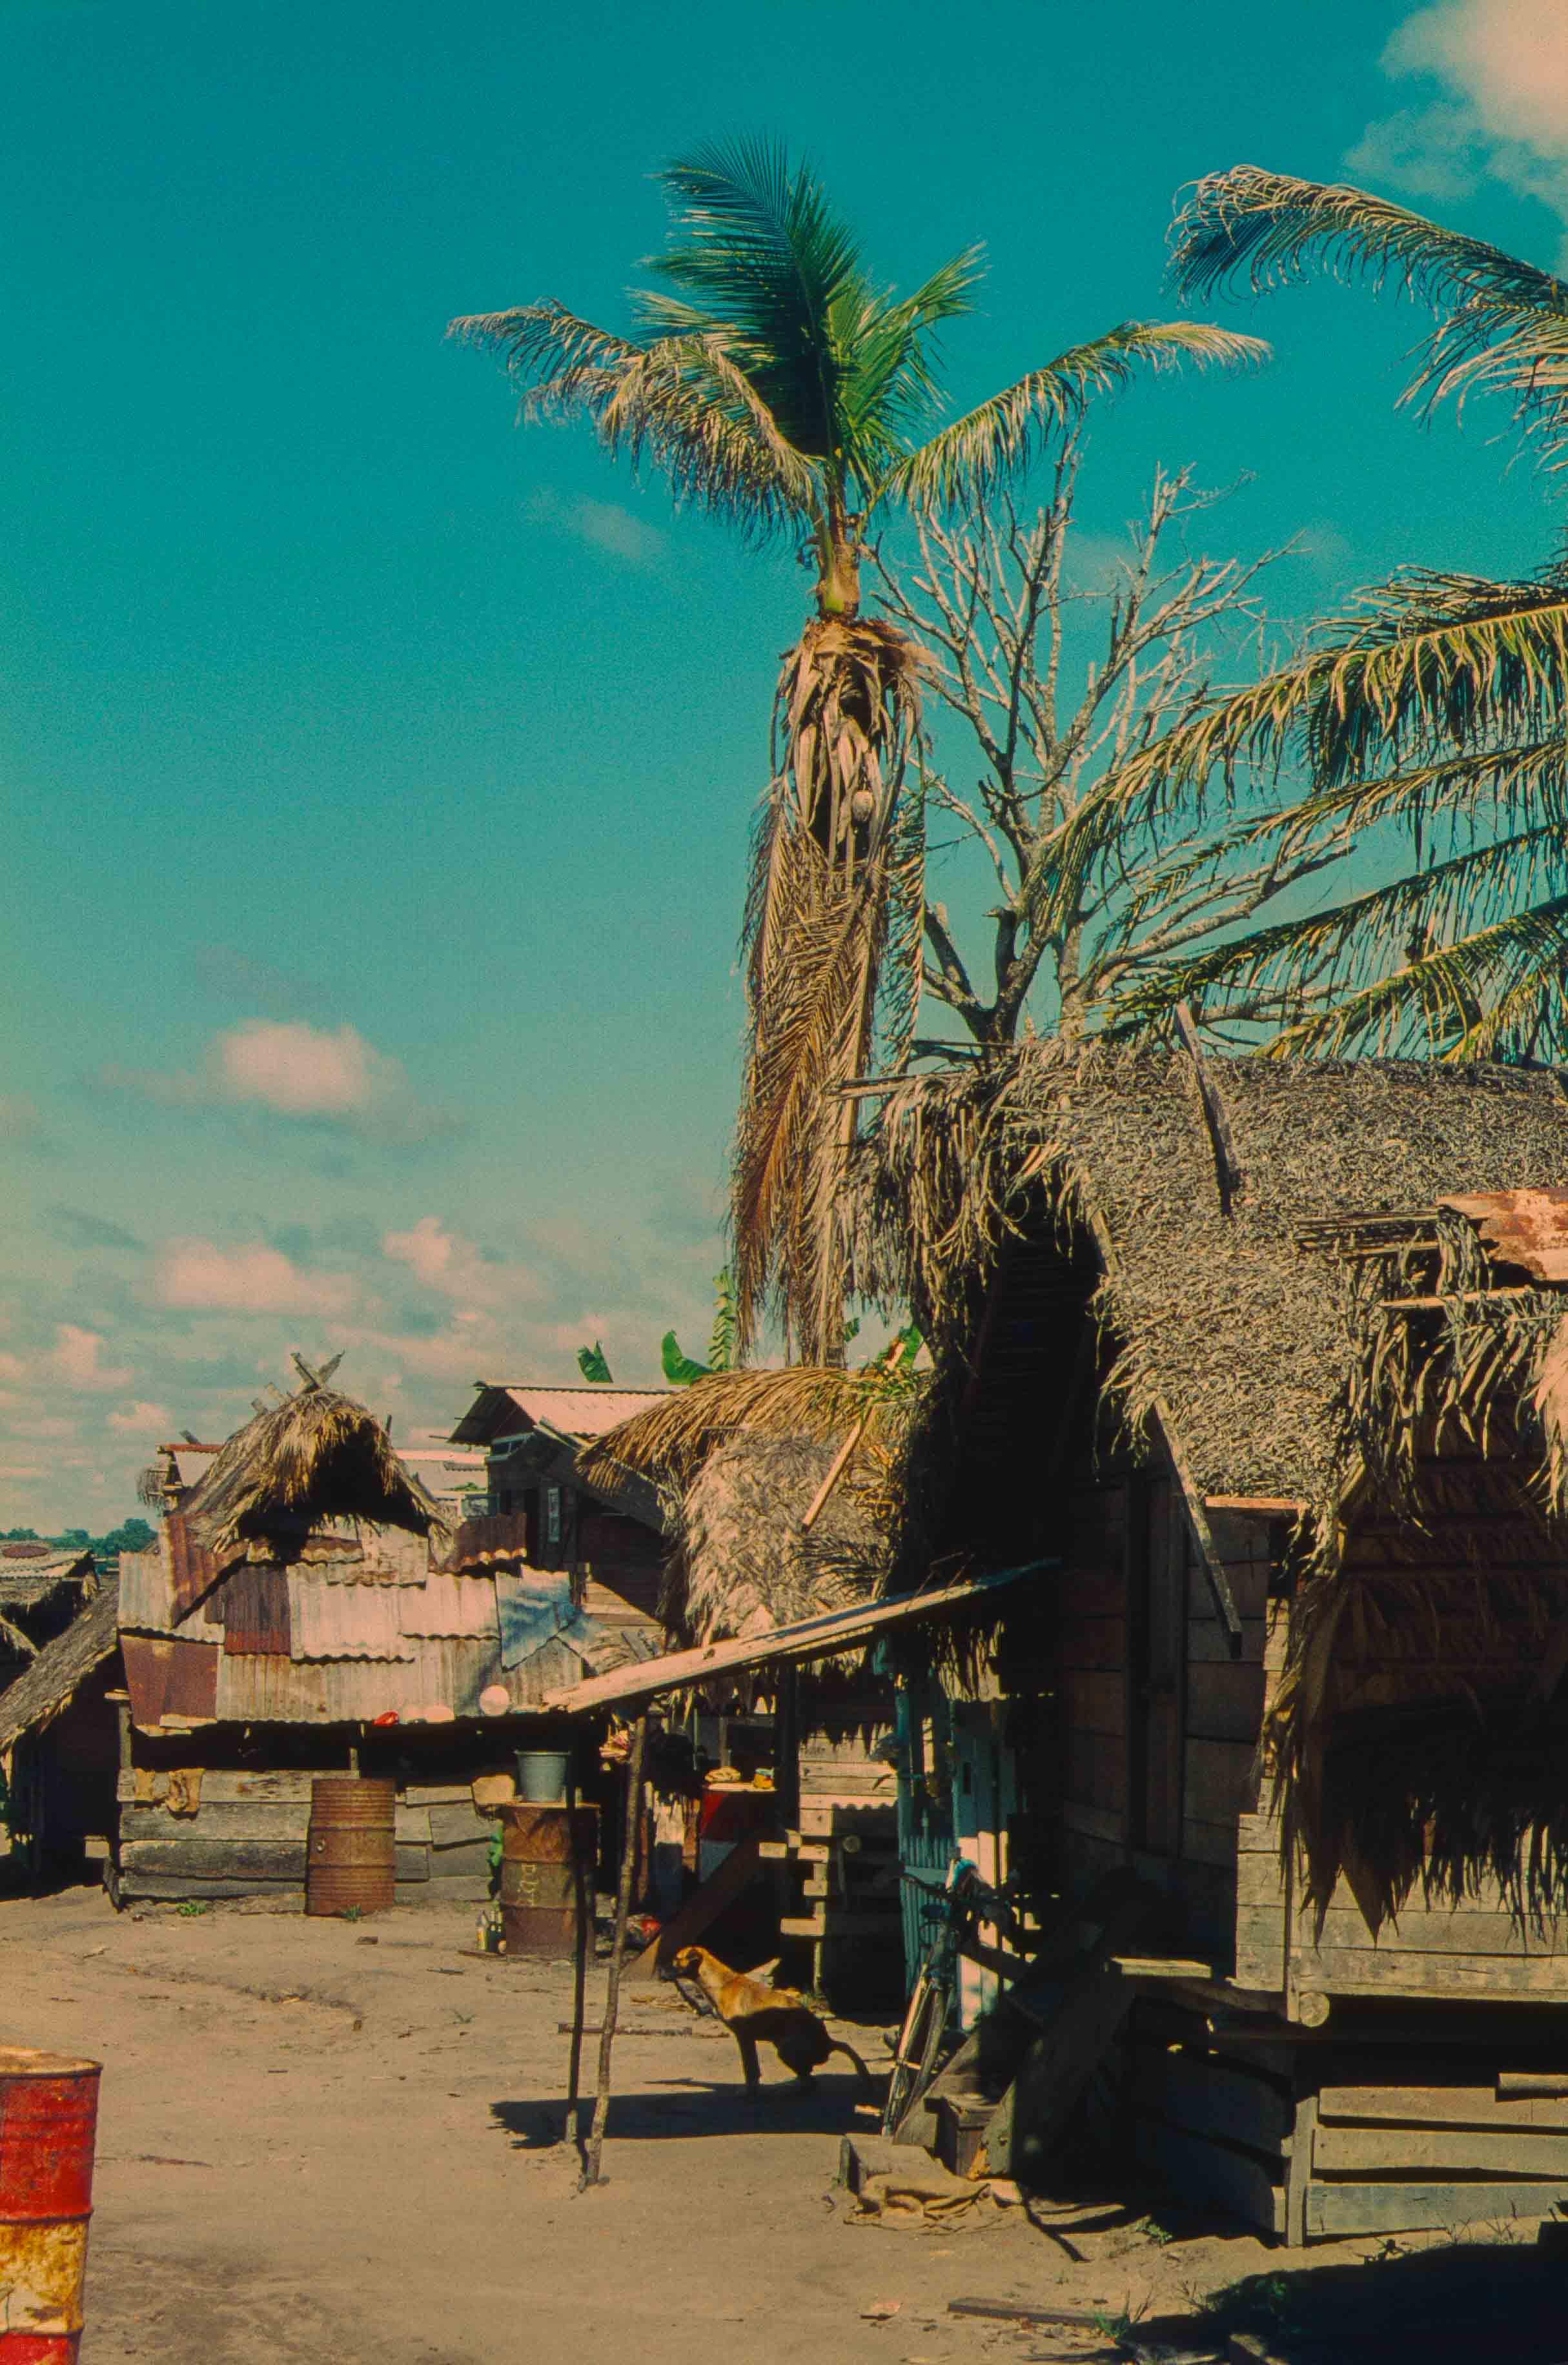 438. Suriname